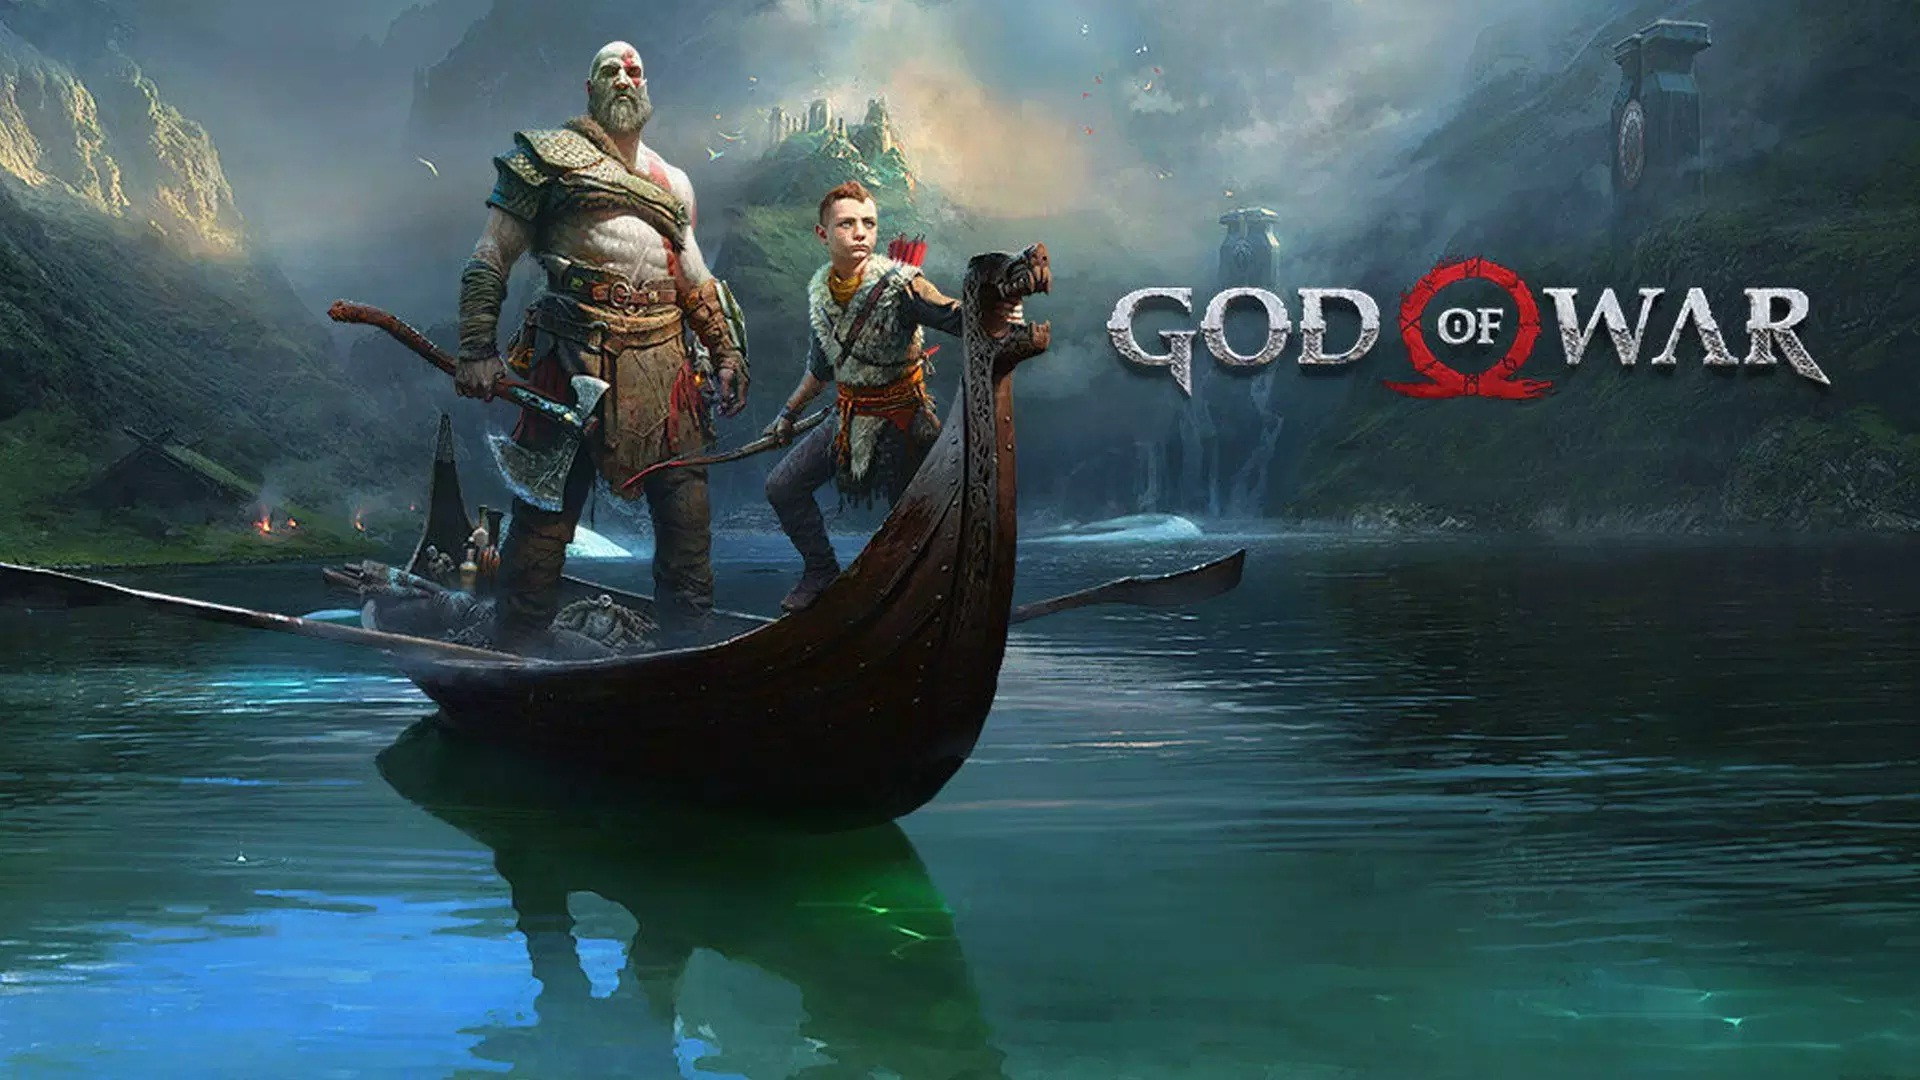 God of War, l'upgrade PS5 è ufficiale: ecco i dettagli